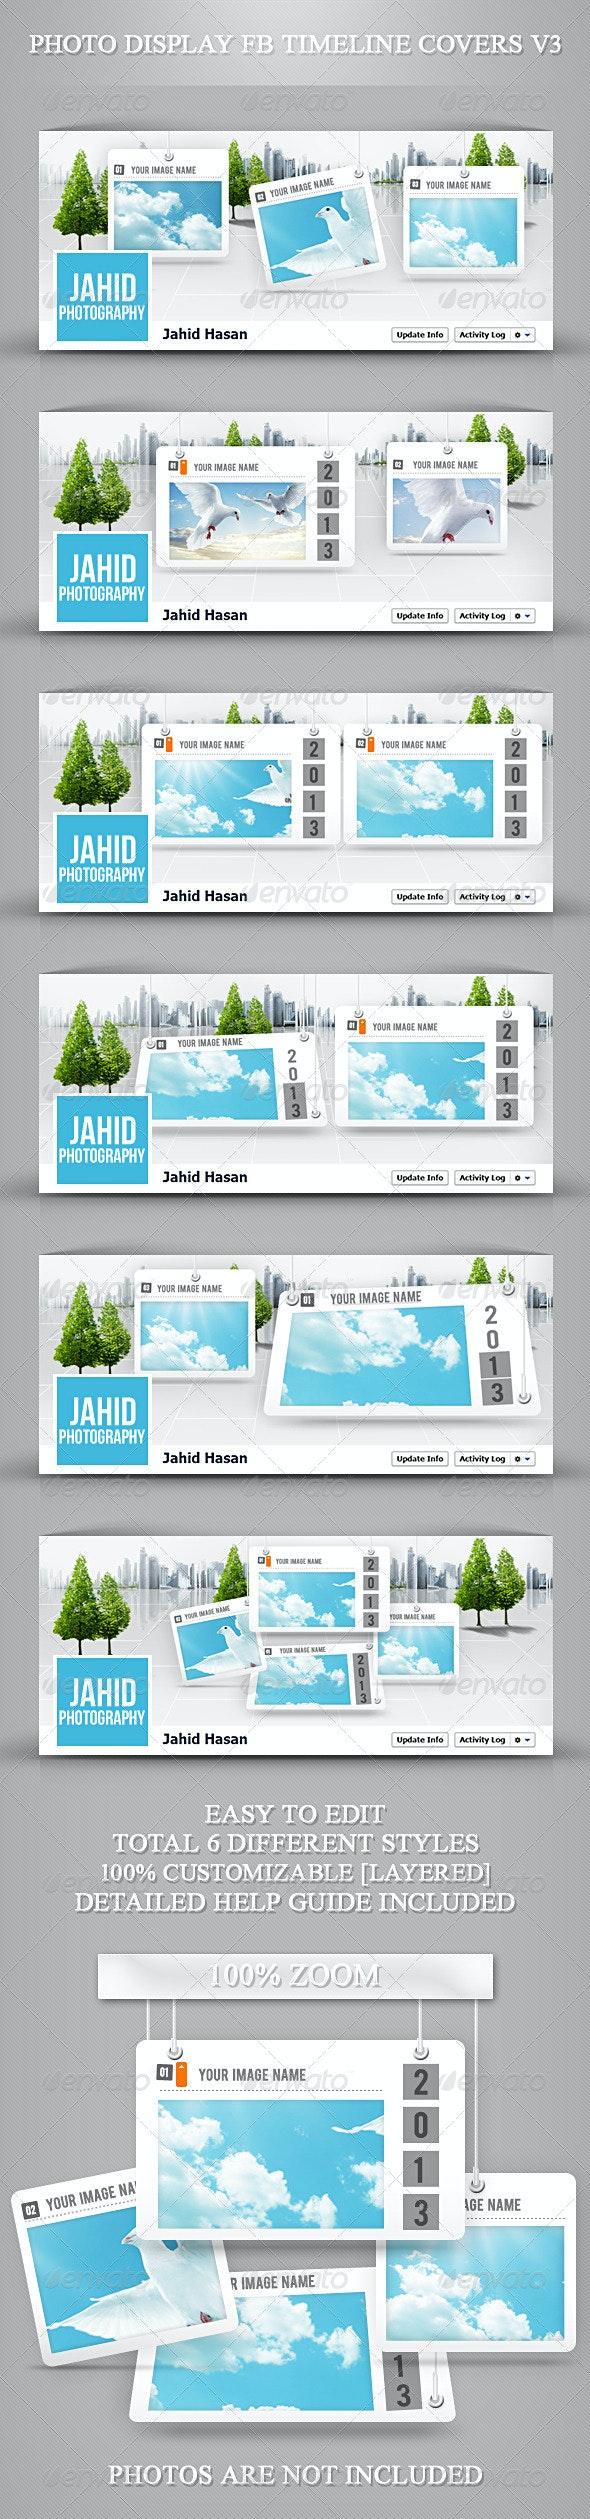 Photo Display FB Timeline Covers V3 - Facebook Timeline Covers Social Media